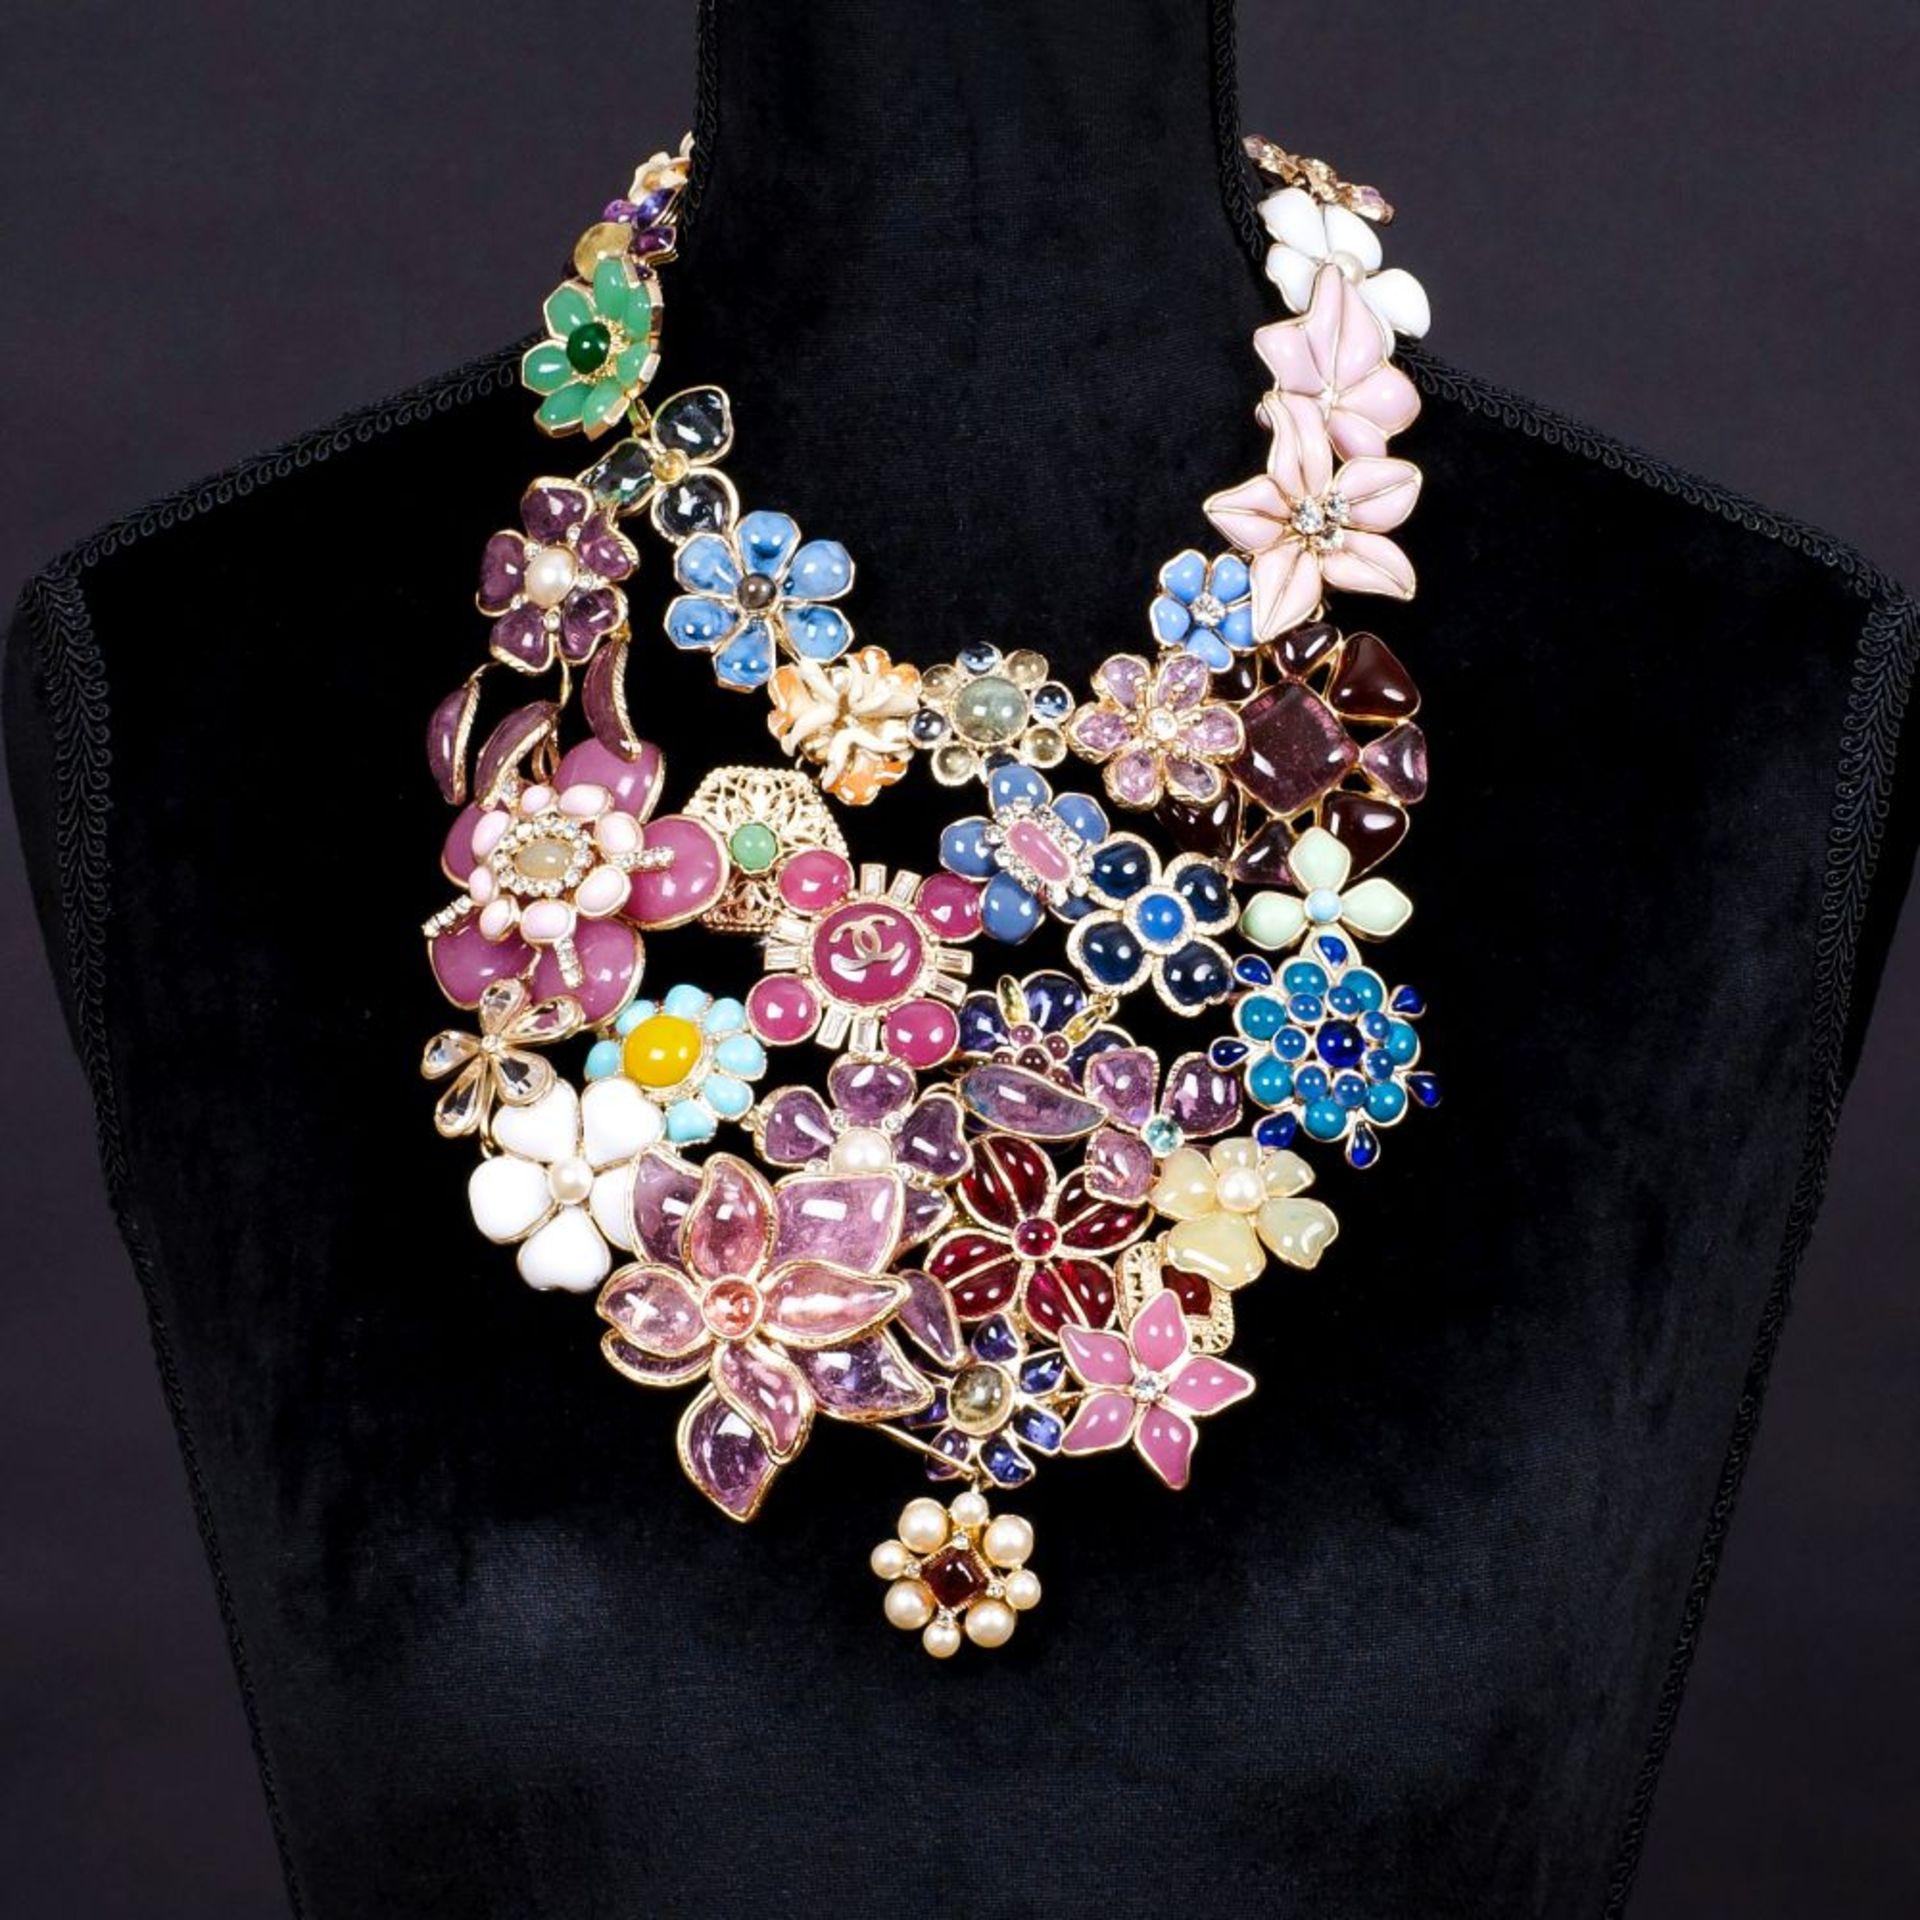 Chanel. Maison Gripoix Blüten-Collier. - Image 2 of 2